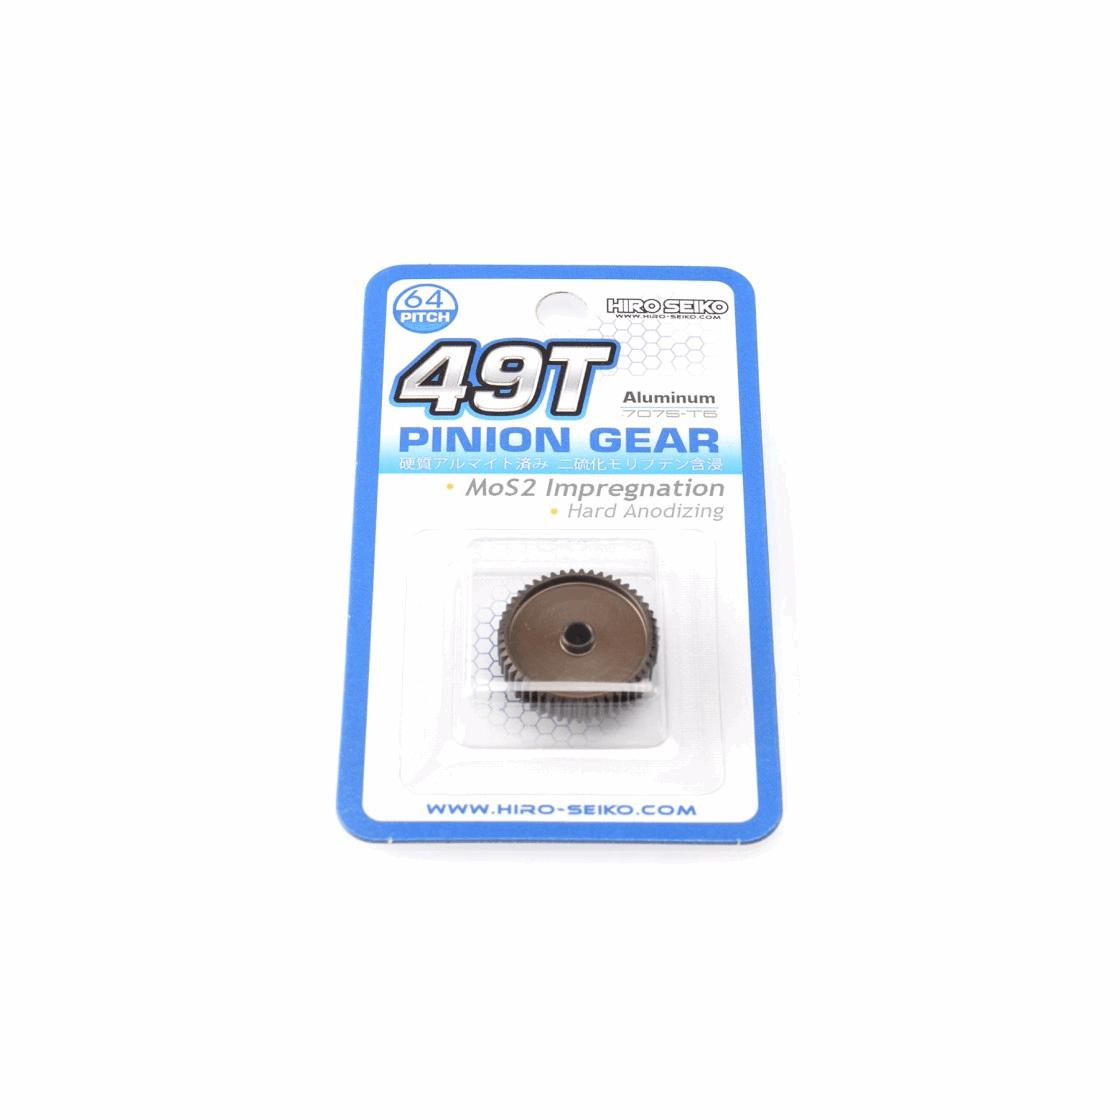 Hiro Seiko Hard Coated Alum. Pinion Gear (MoS2) DP64-49T